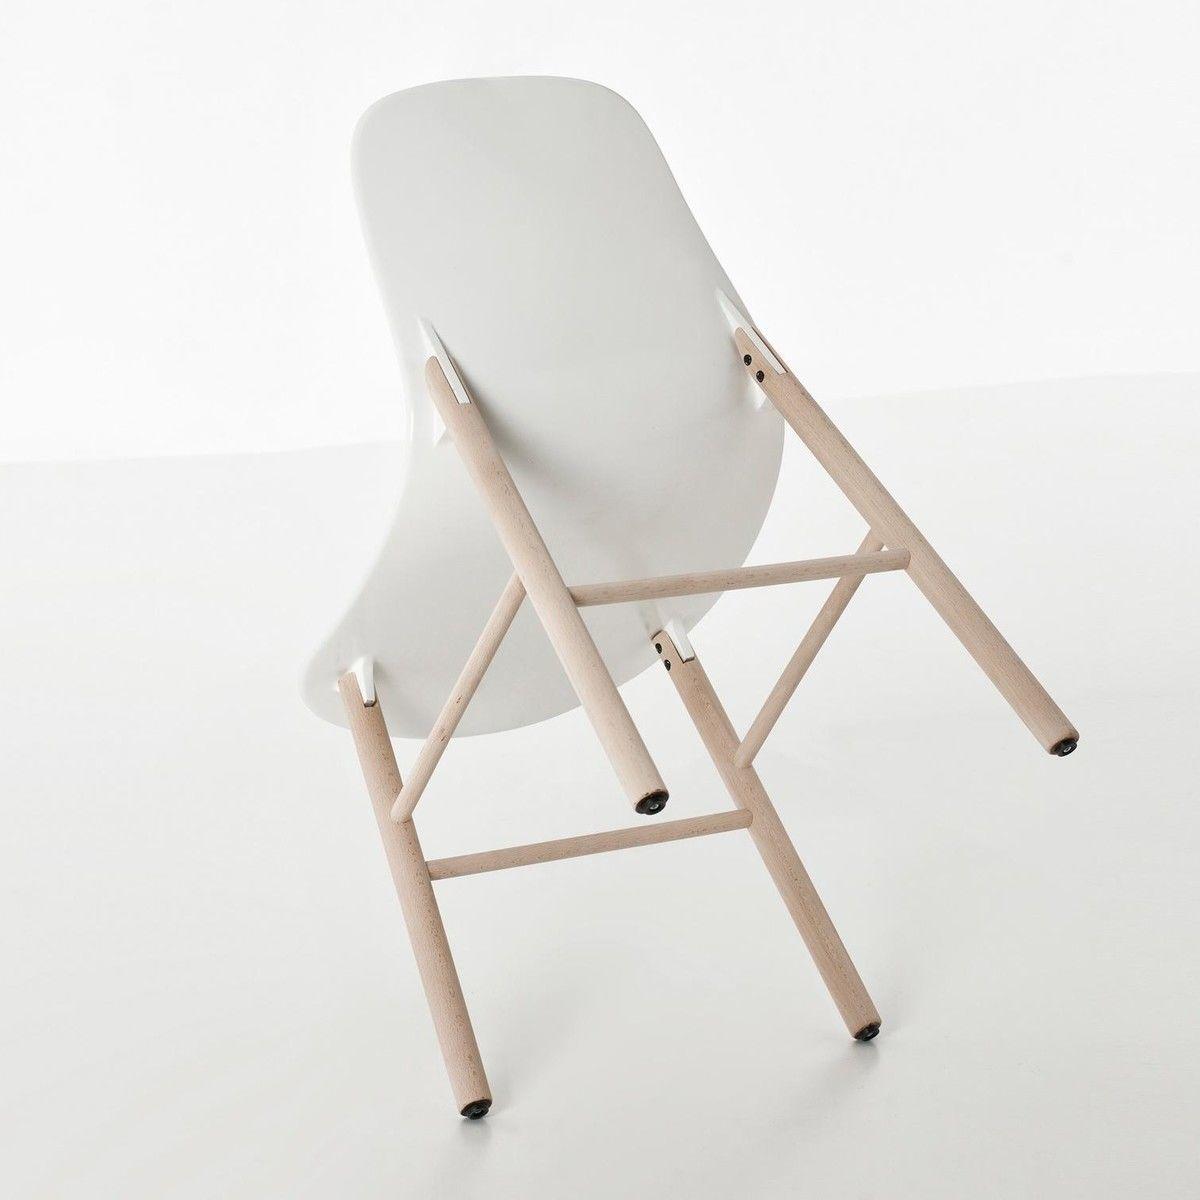 sharky stuhl kristalia. Black Bedroom Furniture Sets. Home Design Ideas